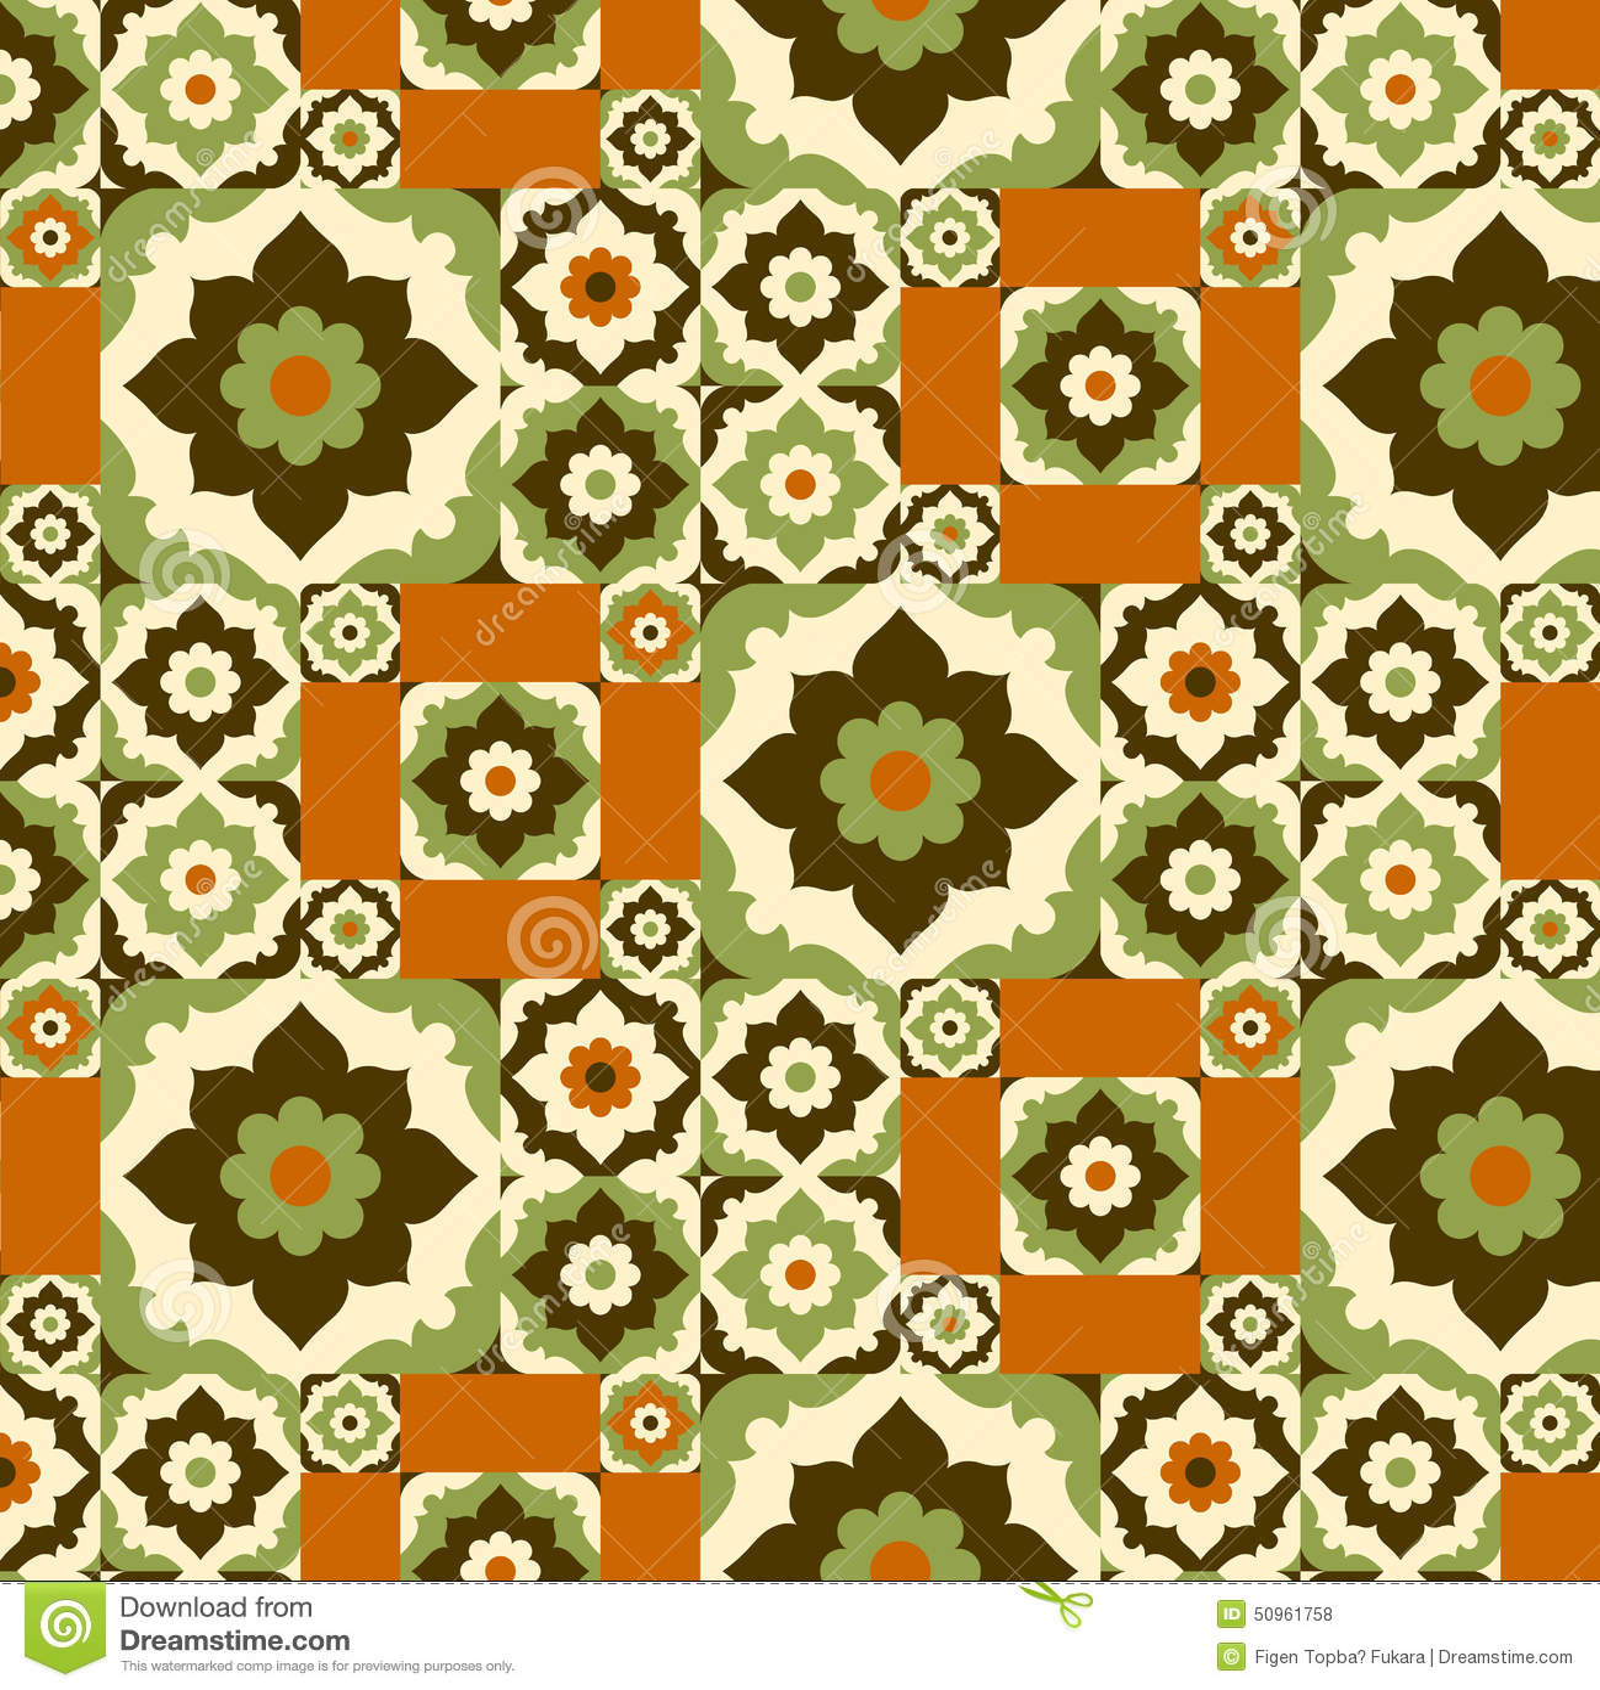 Seamless pattern retro ceramic tile design with floral ornate seamless pattern retro ceramic tile design with floral ornate dailygadgetfo Choice Image